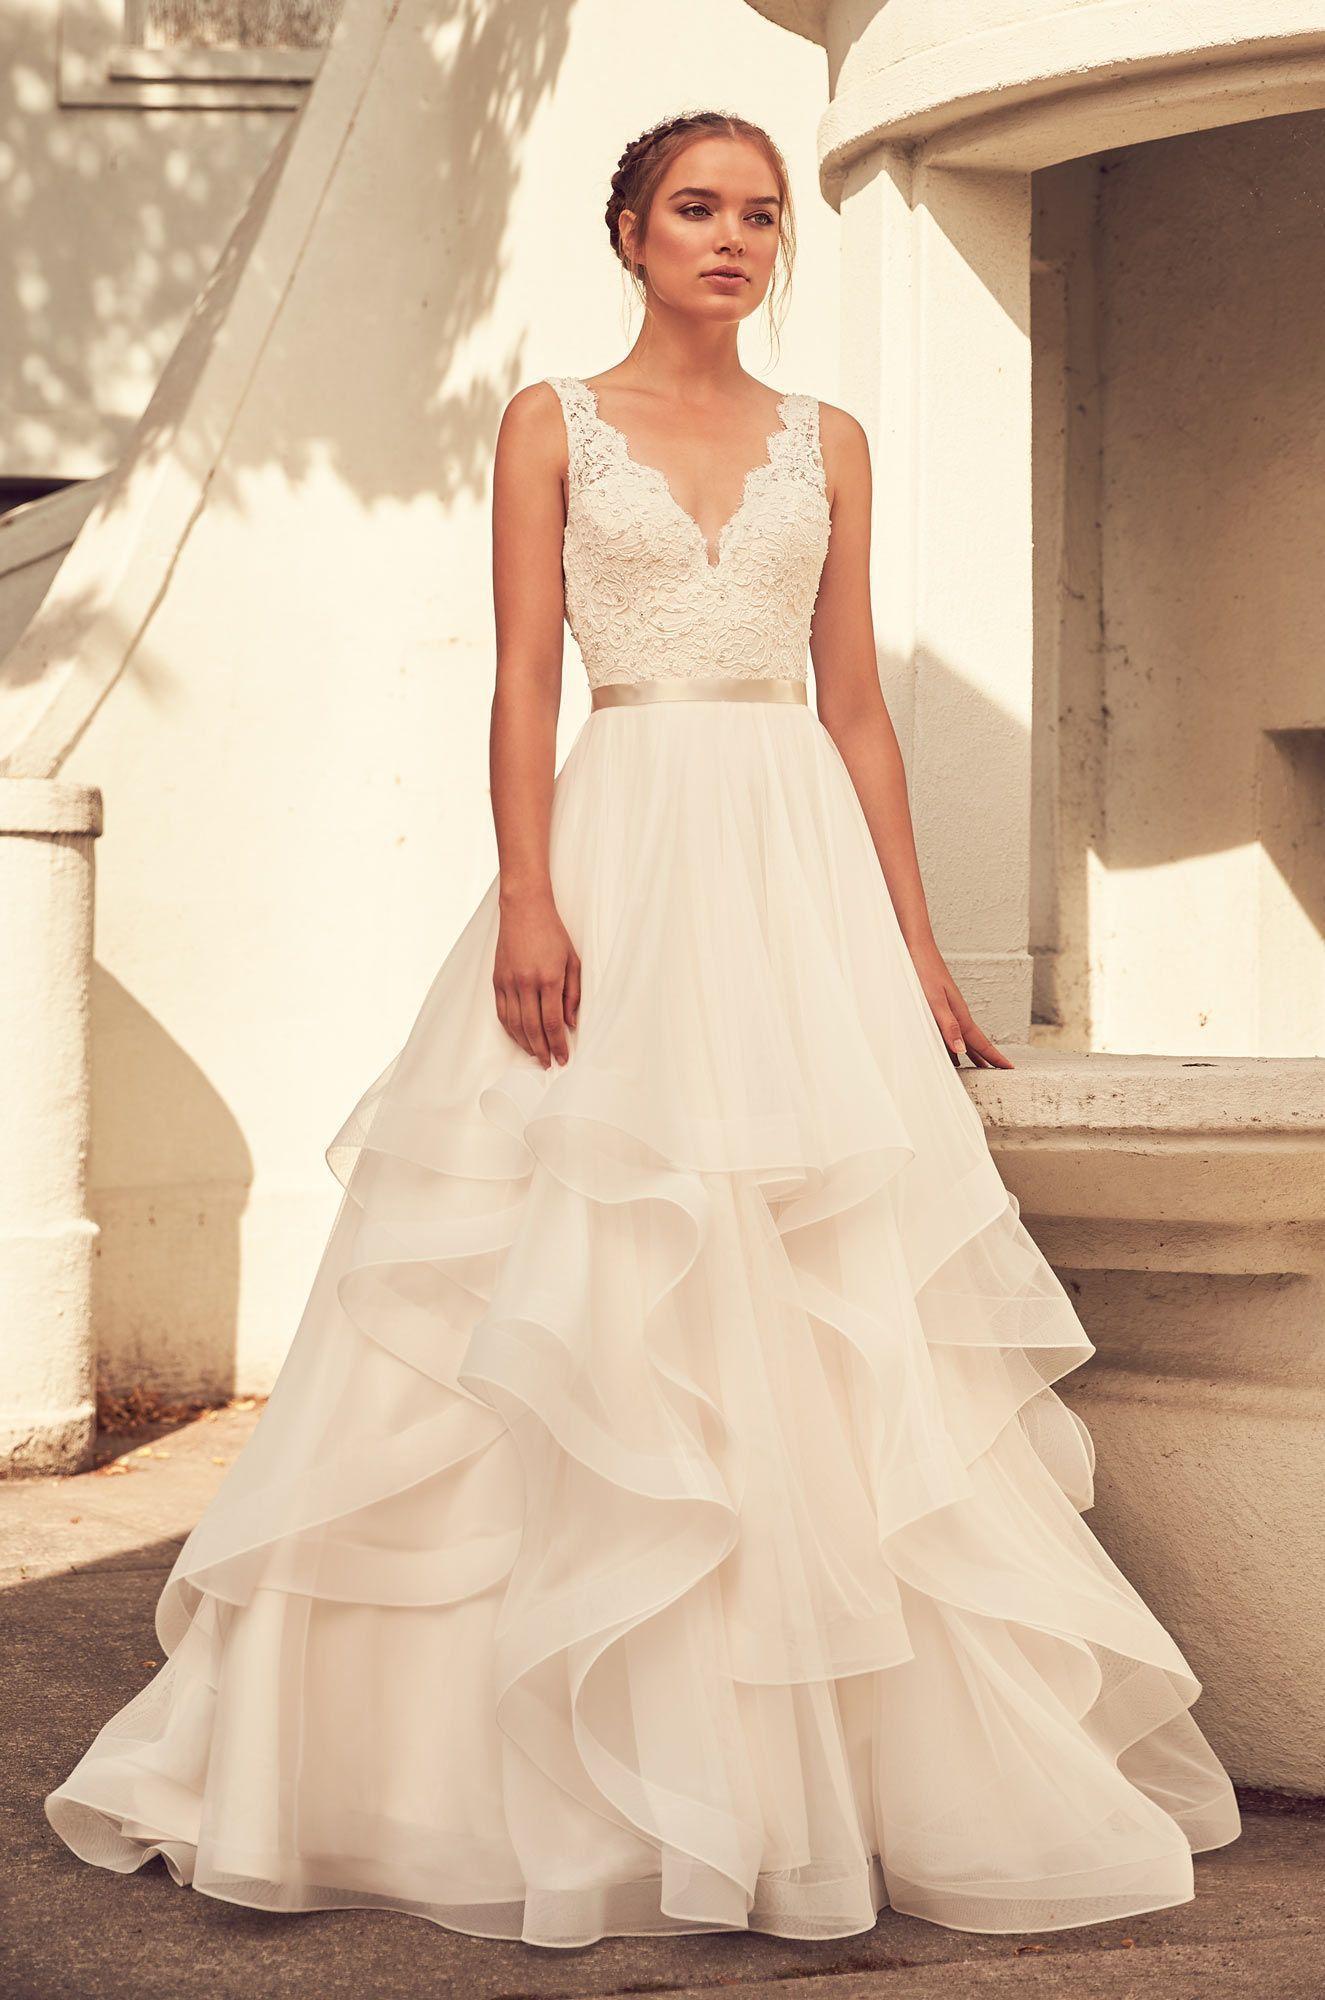 Style 4798 | French Alençon Lace and Mesh Tulle Wedding ...